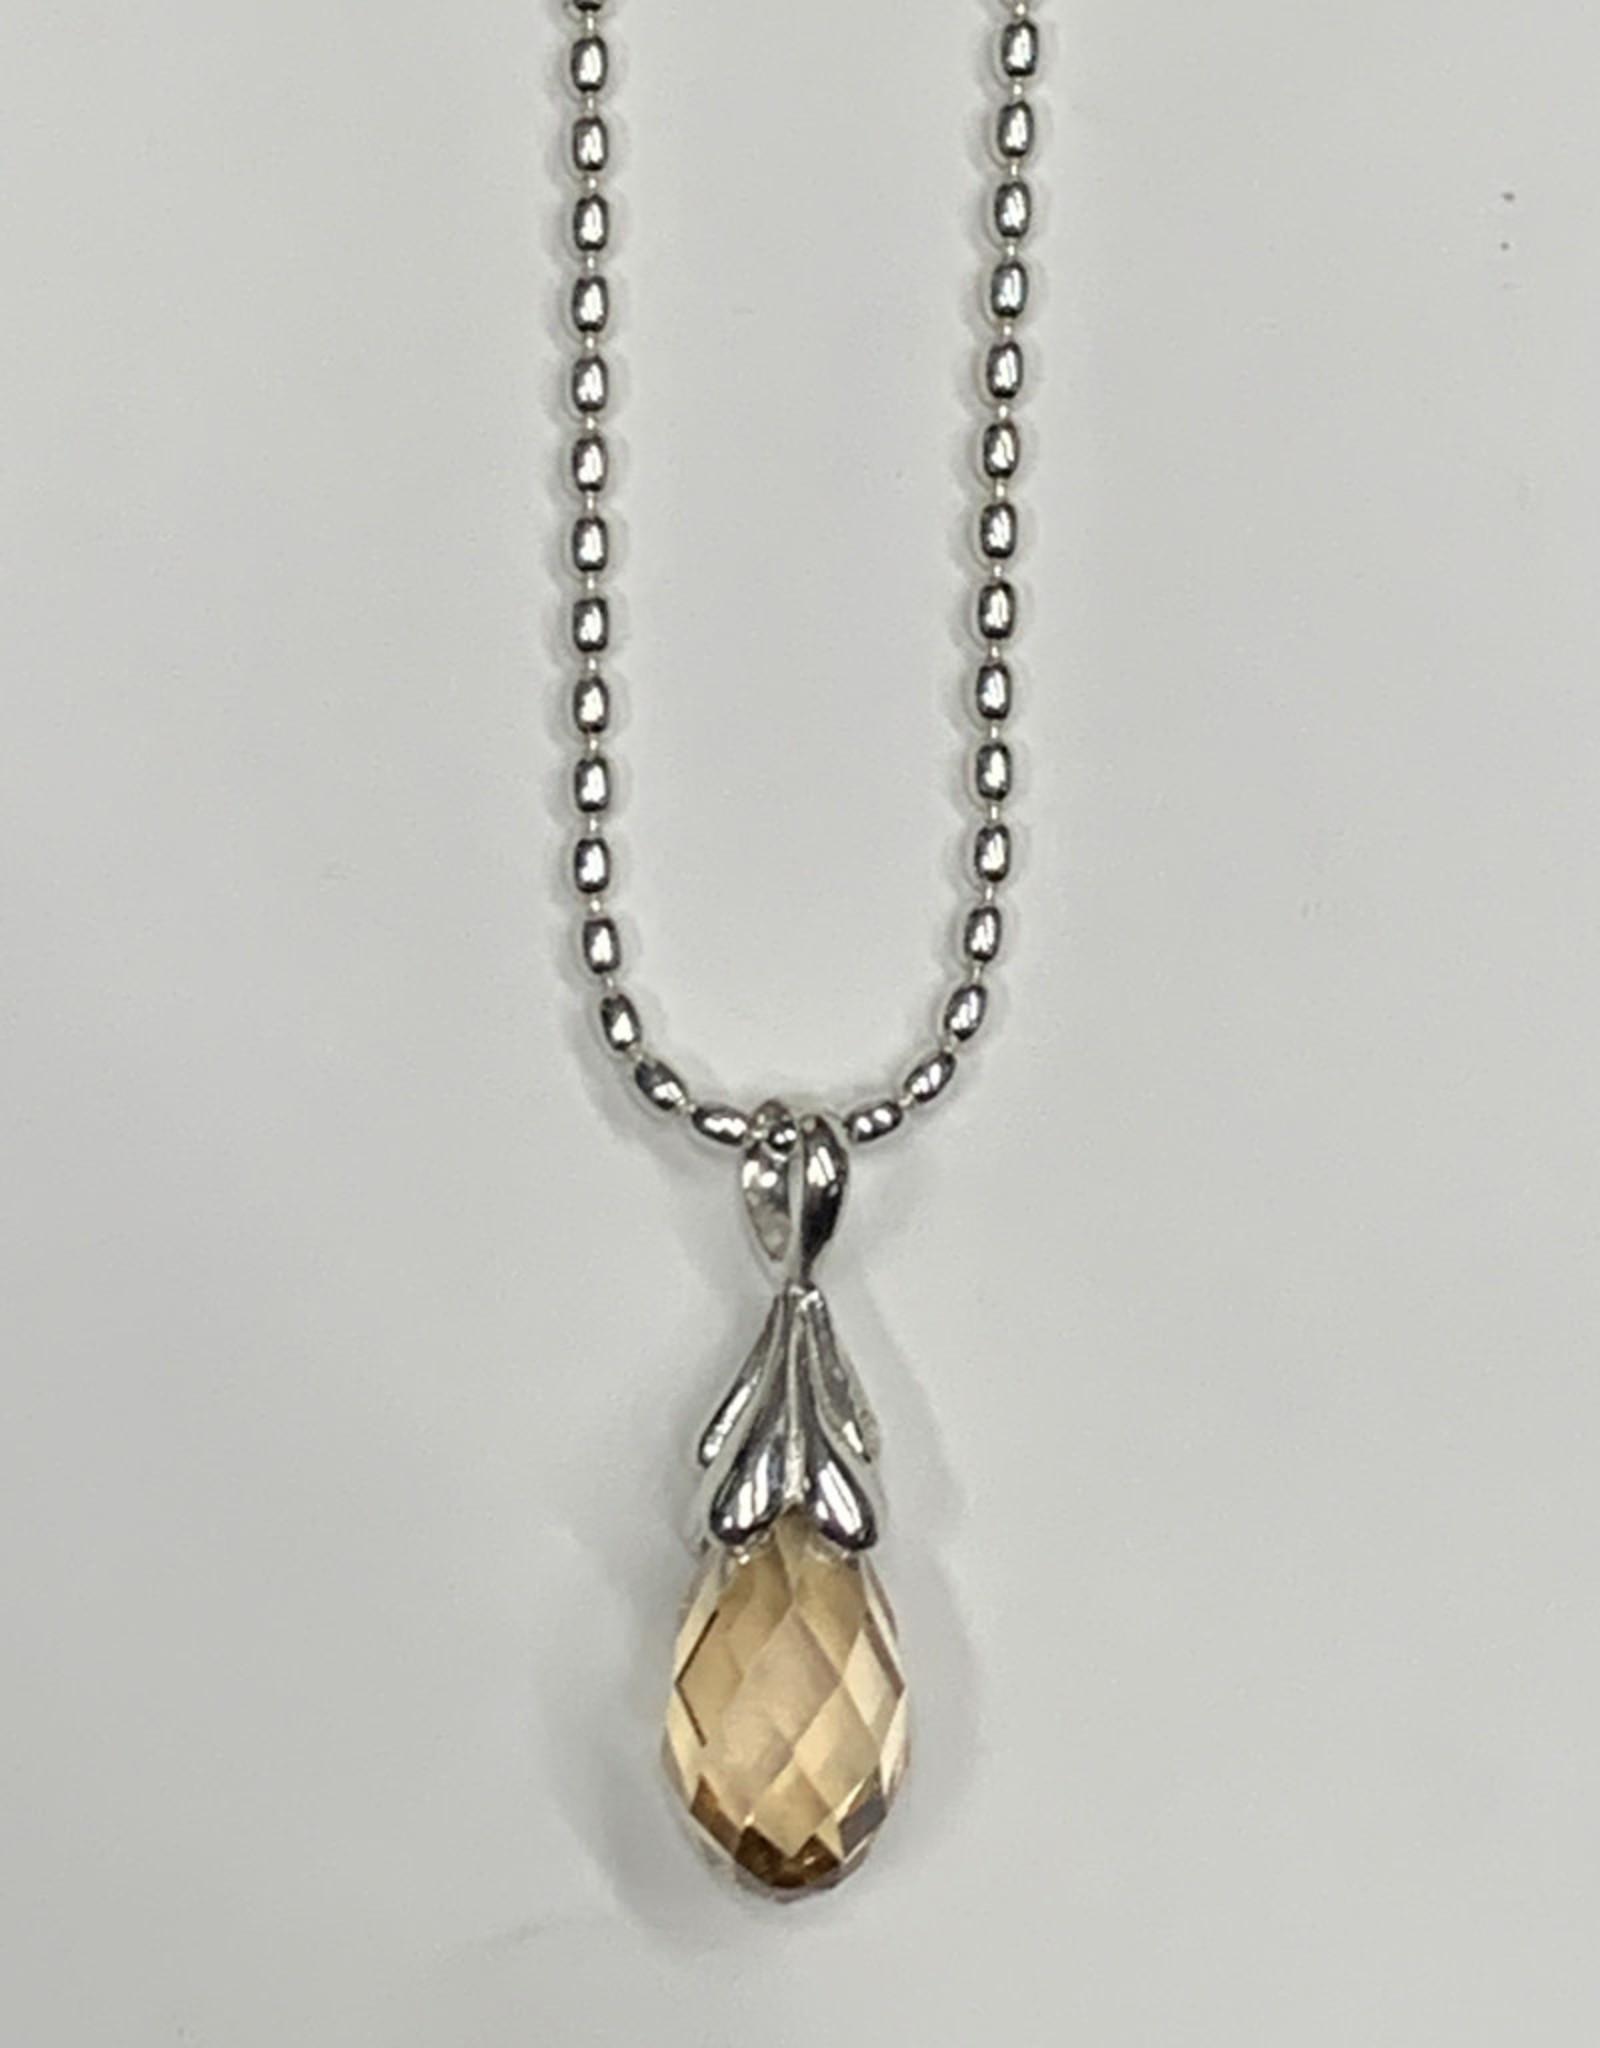 Mignon Faget Mignon Faget Honey Drop Chain Necklace